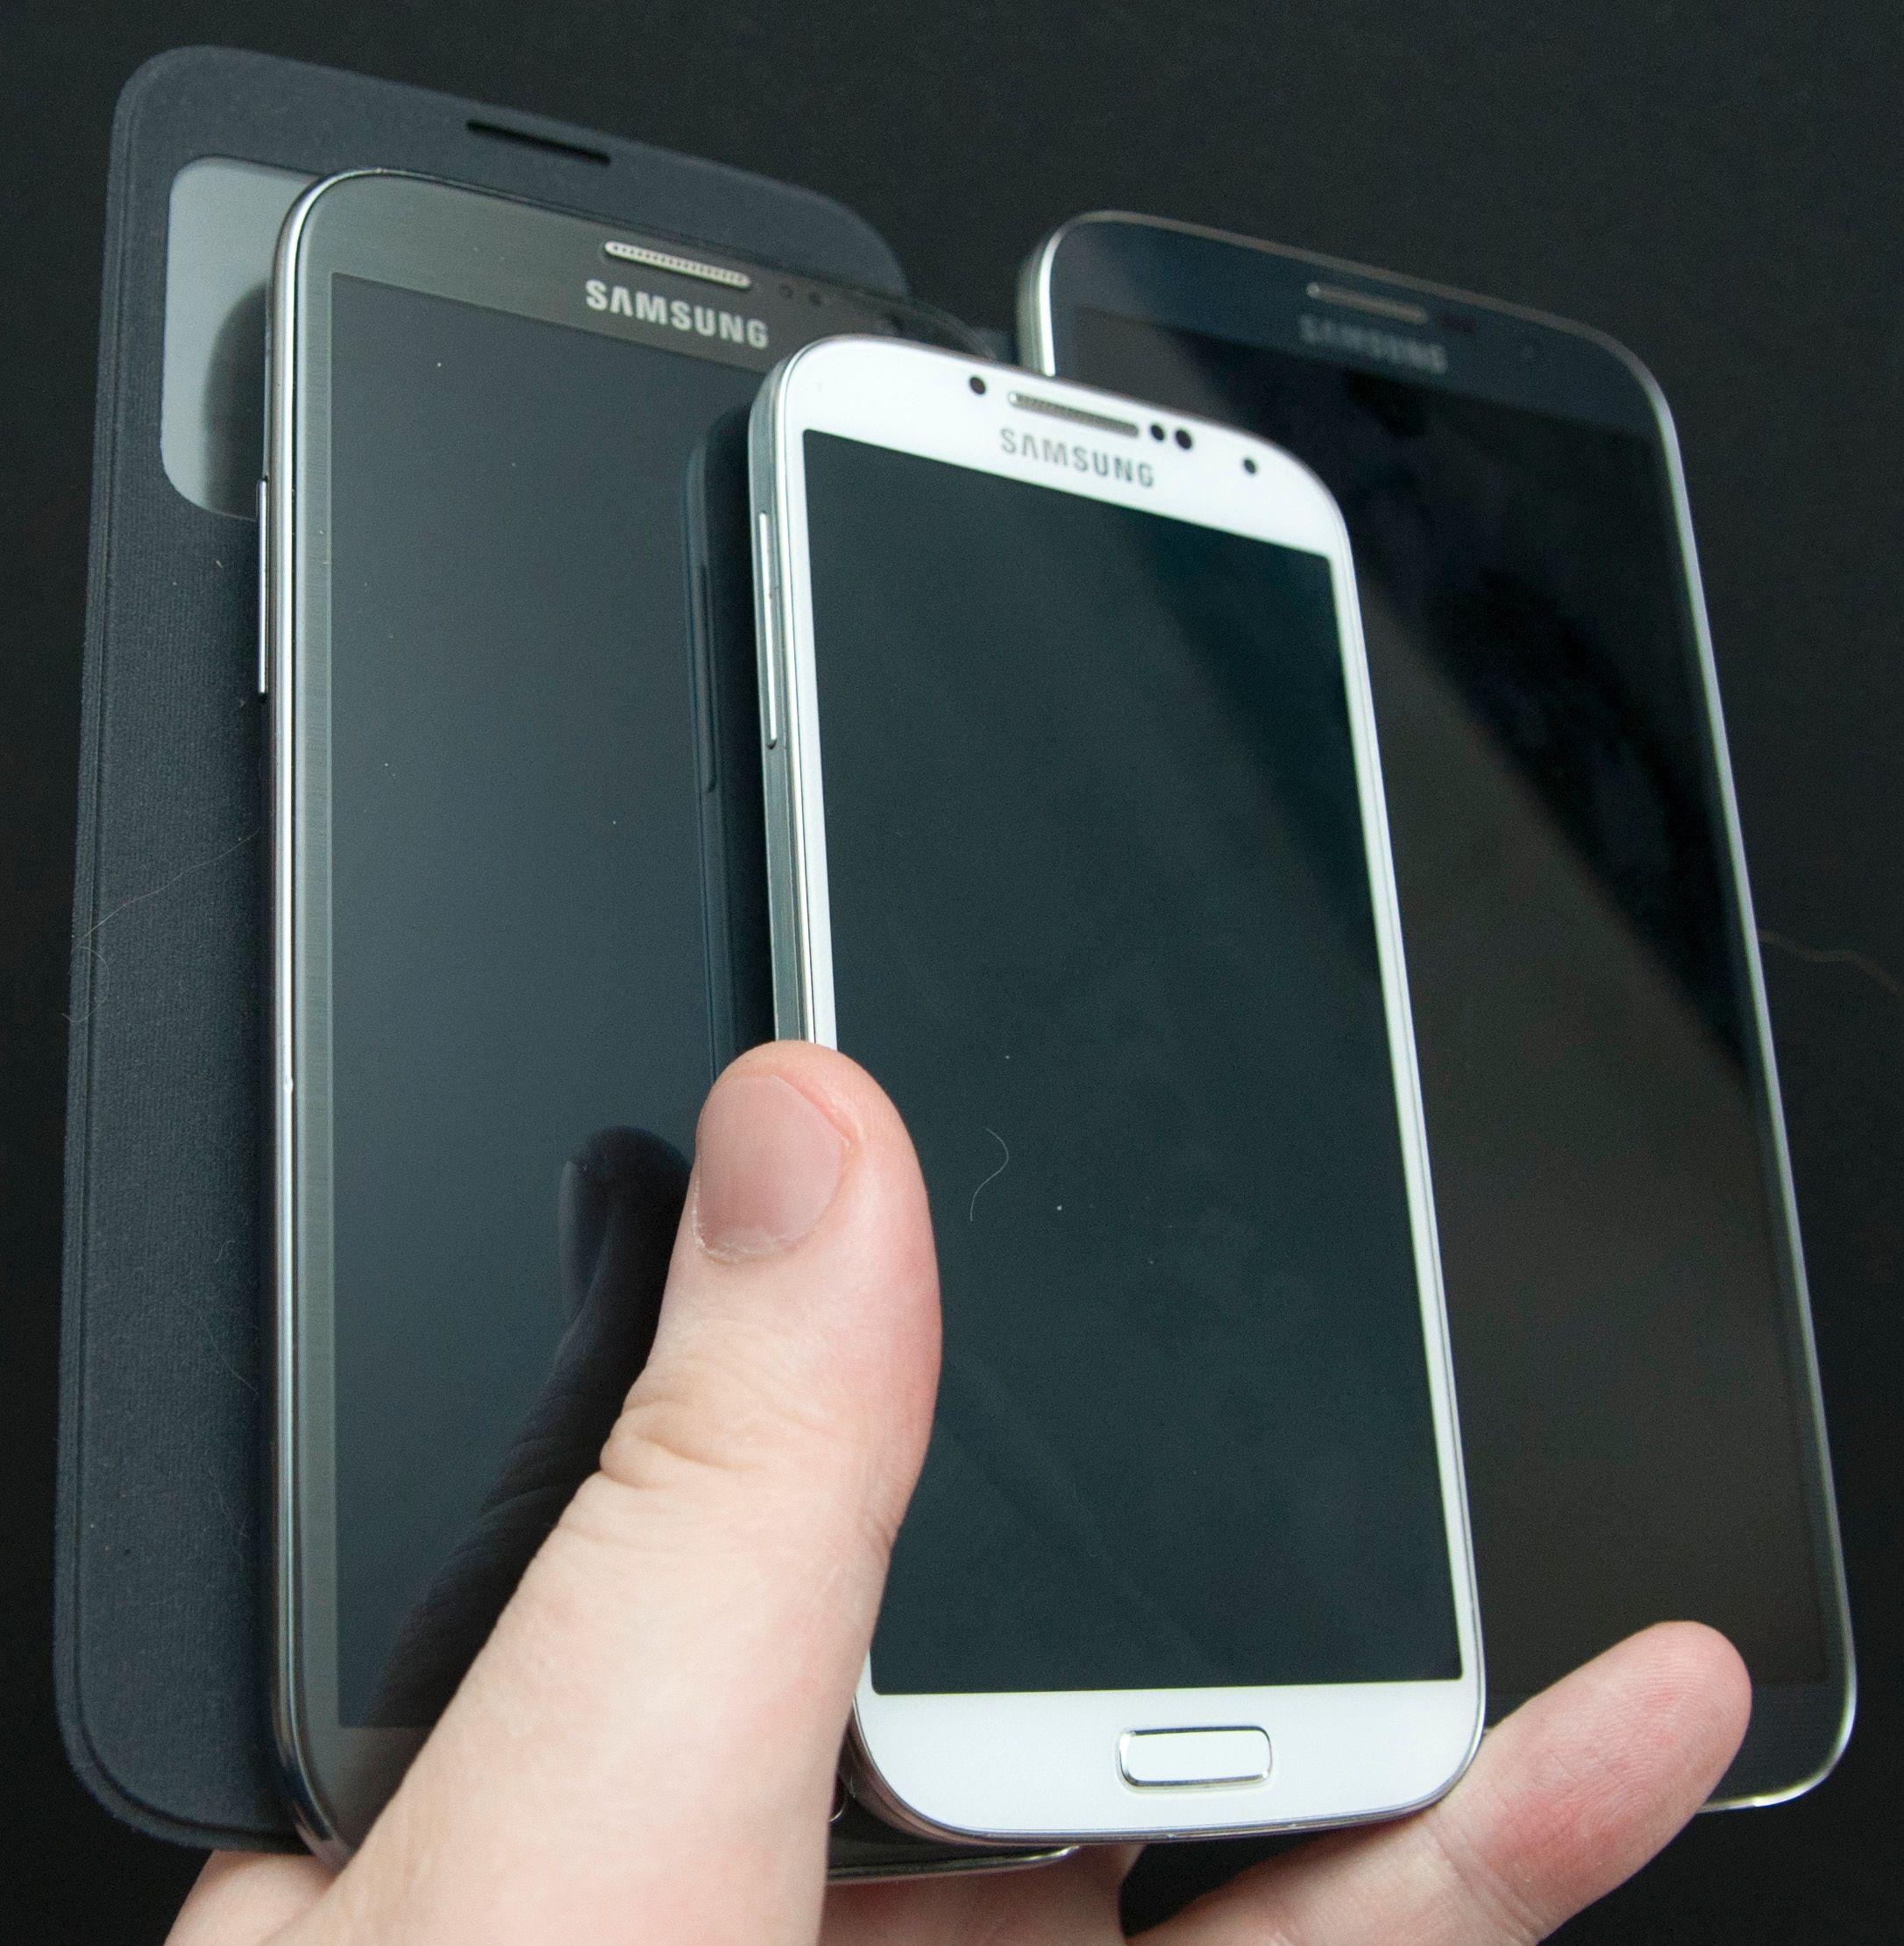 Galaxy S4 i midten fremst. Galaxy Note II til venstre. Galaxy Mega er virkelig en diger telefon.Foto: Finn Jarle Kvalheim, Amobil.no